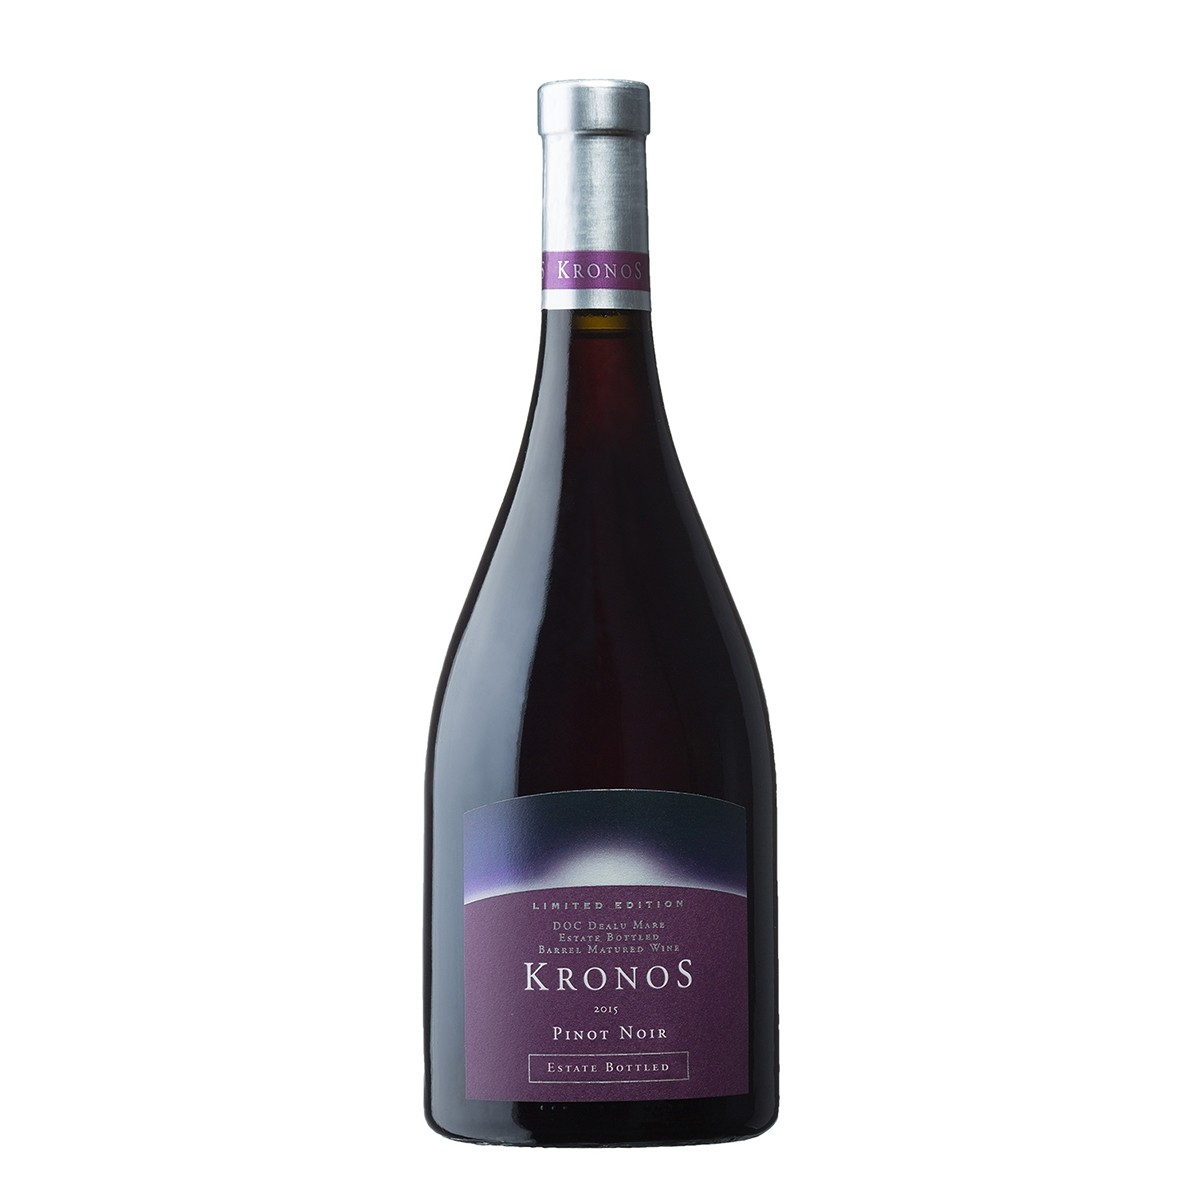 Kronos Pinot Noir 2015